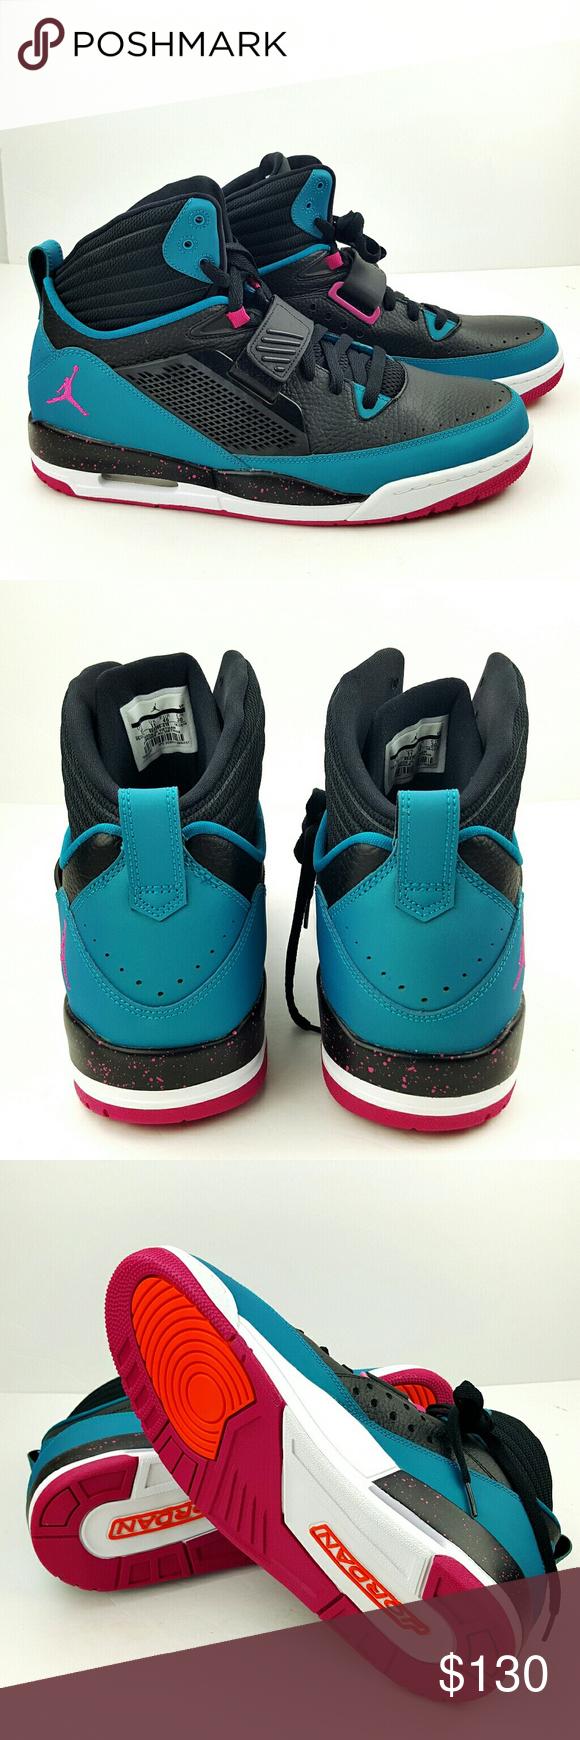 9e854b8f173e Air Jordan Flight 97 Basketball shoes size 12 Jordan Flight 97 Old School  High Top in black and teal. Brand new in original box . Size men s 12 Jordan  Shoes ...